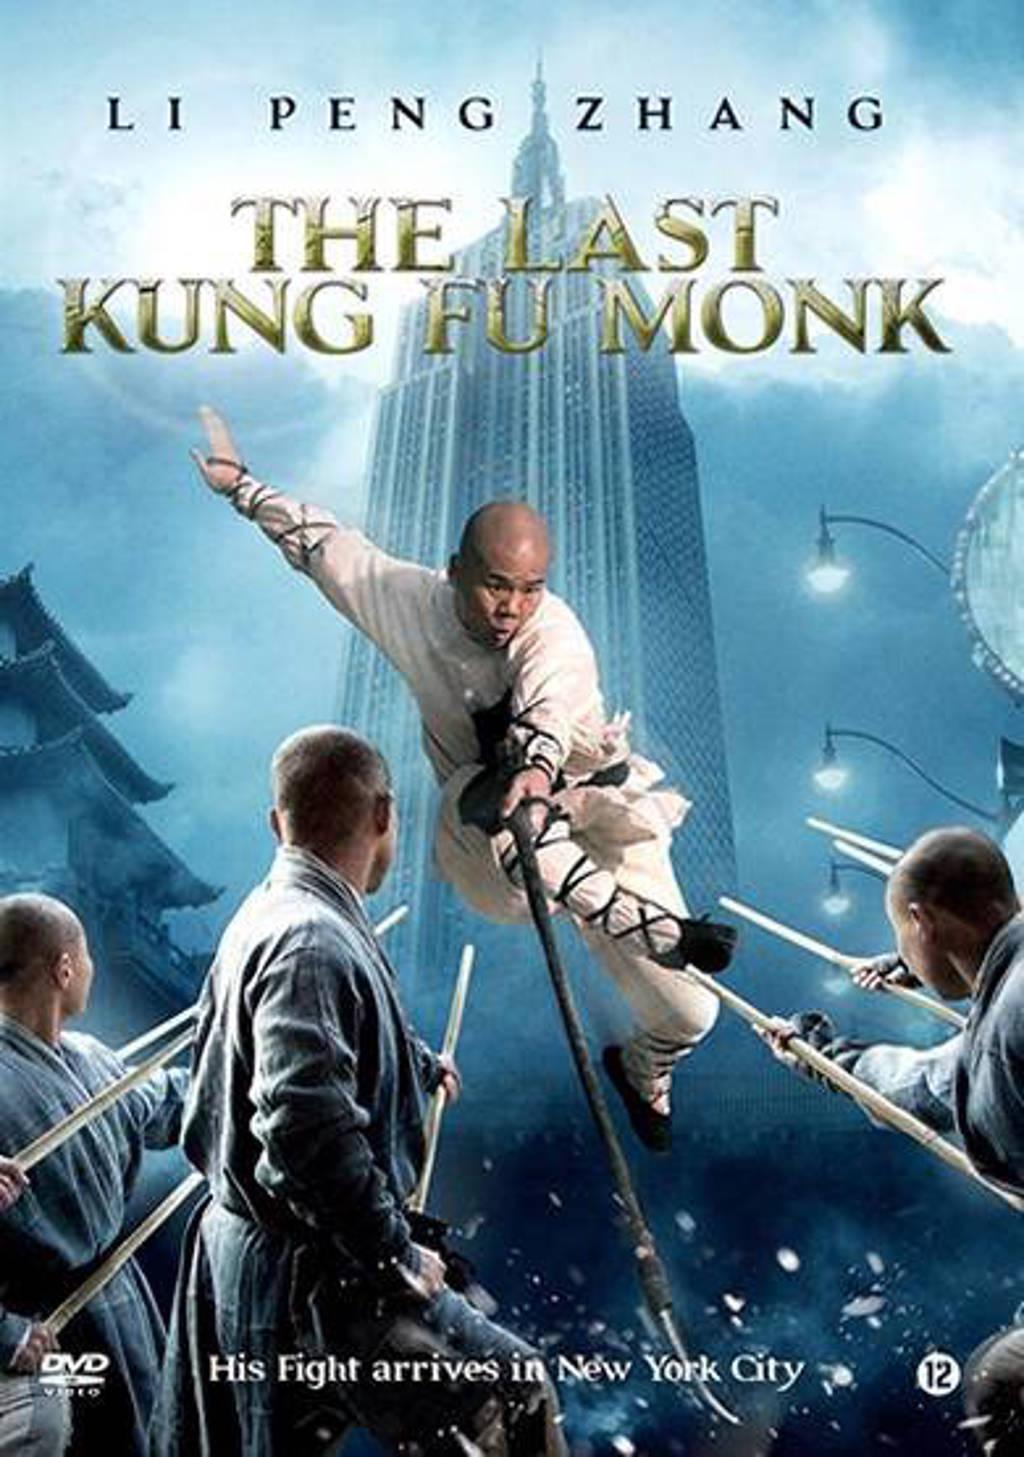 Last kung fu monk (DVD)